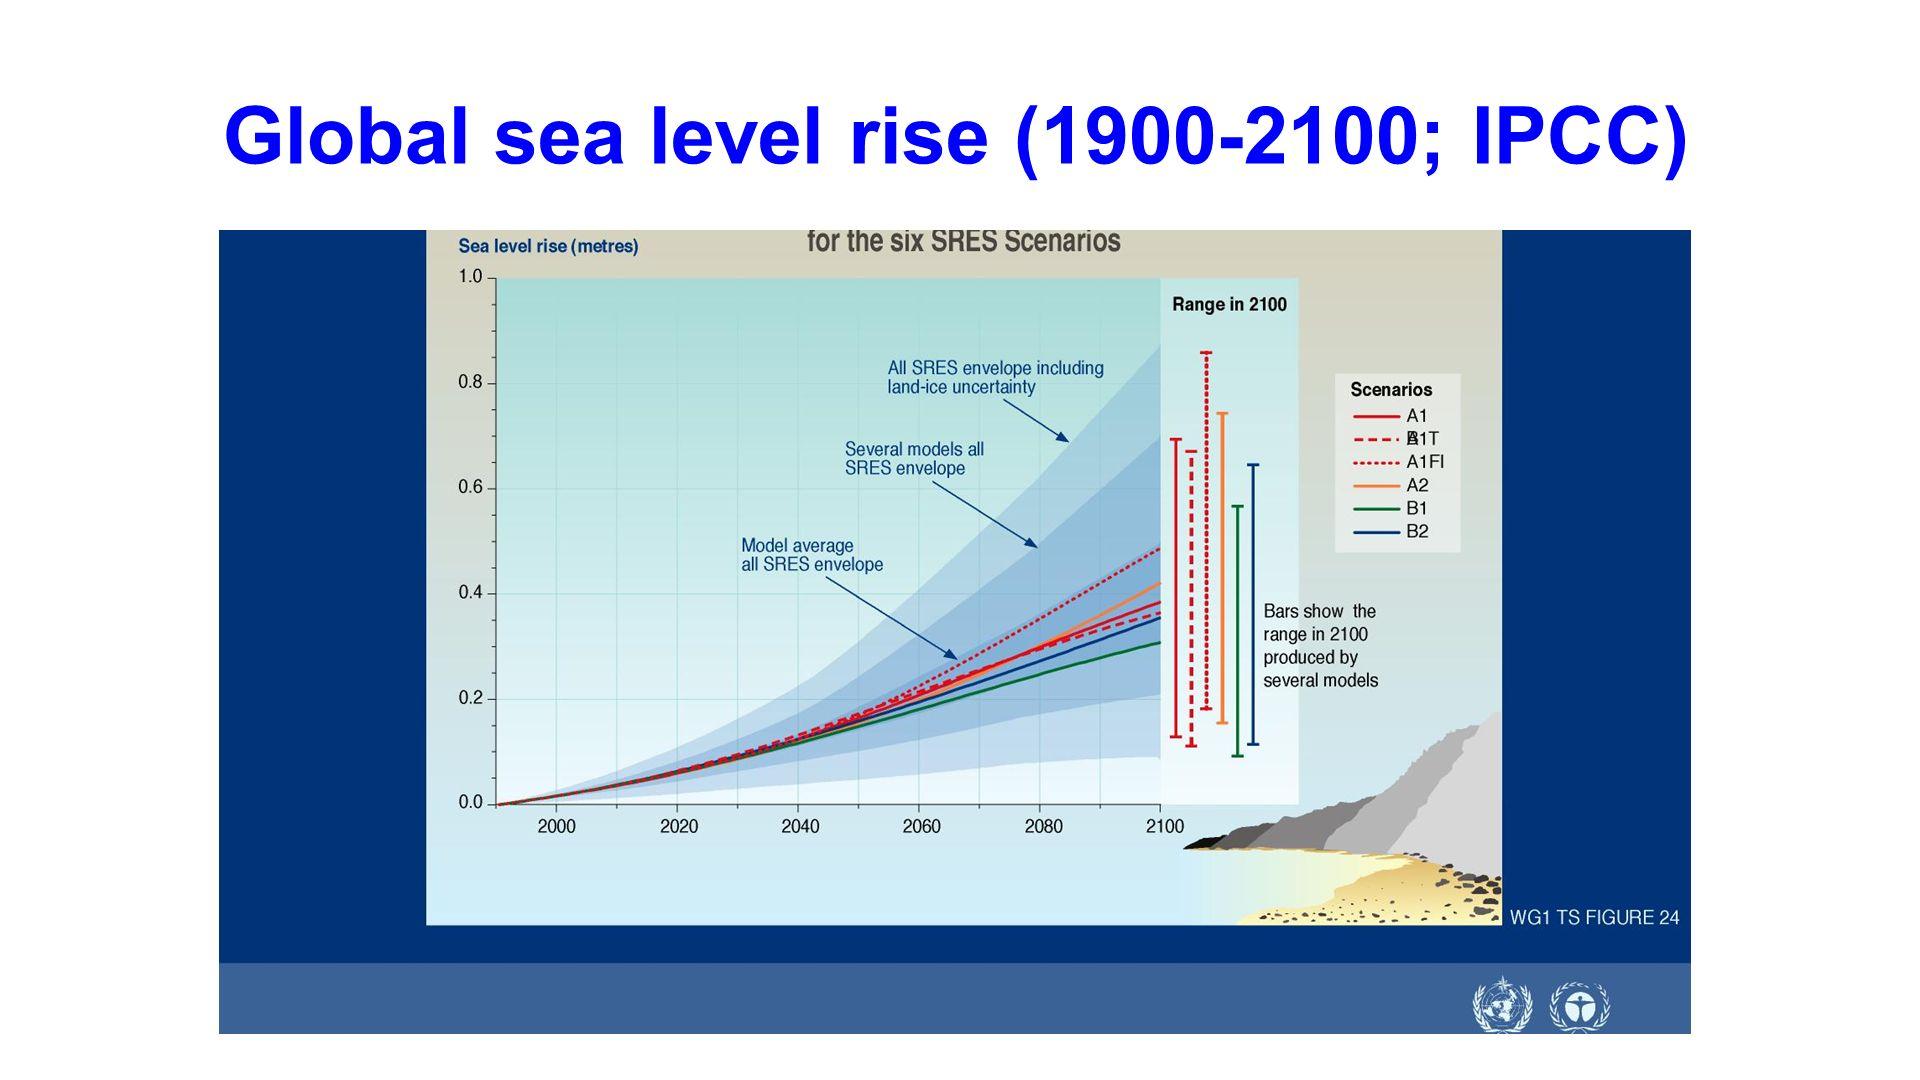 Global sea level rise (1900-2100; IPCC)